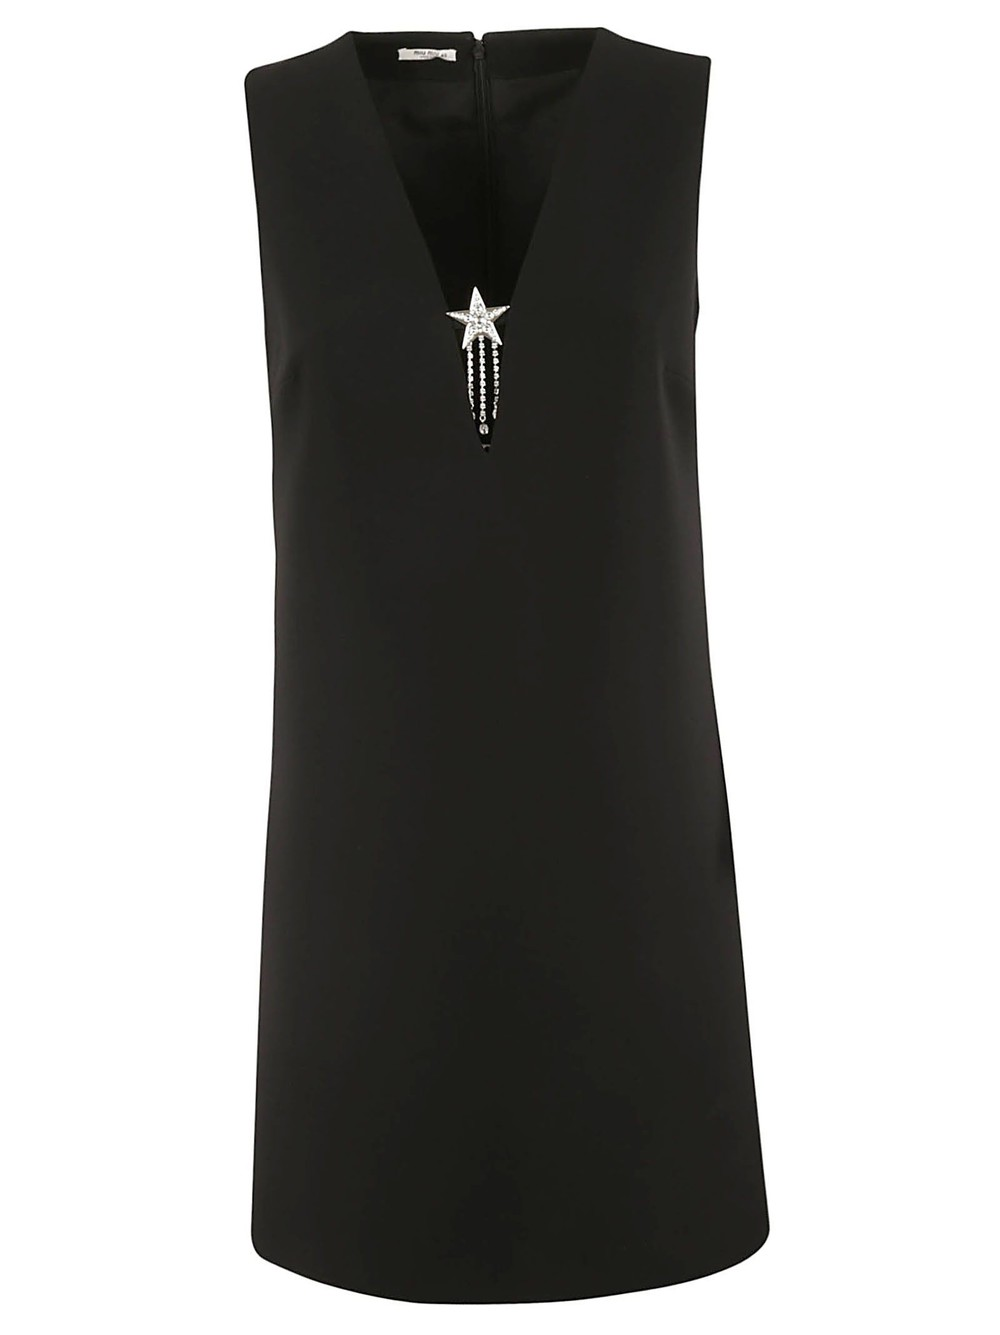 Miu Miu Cady Dress in black